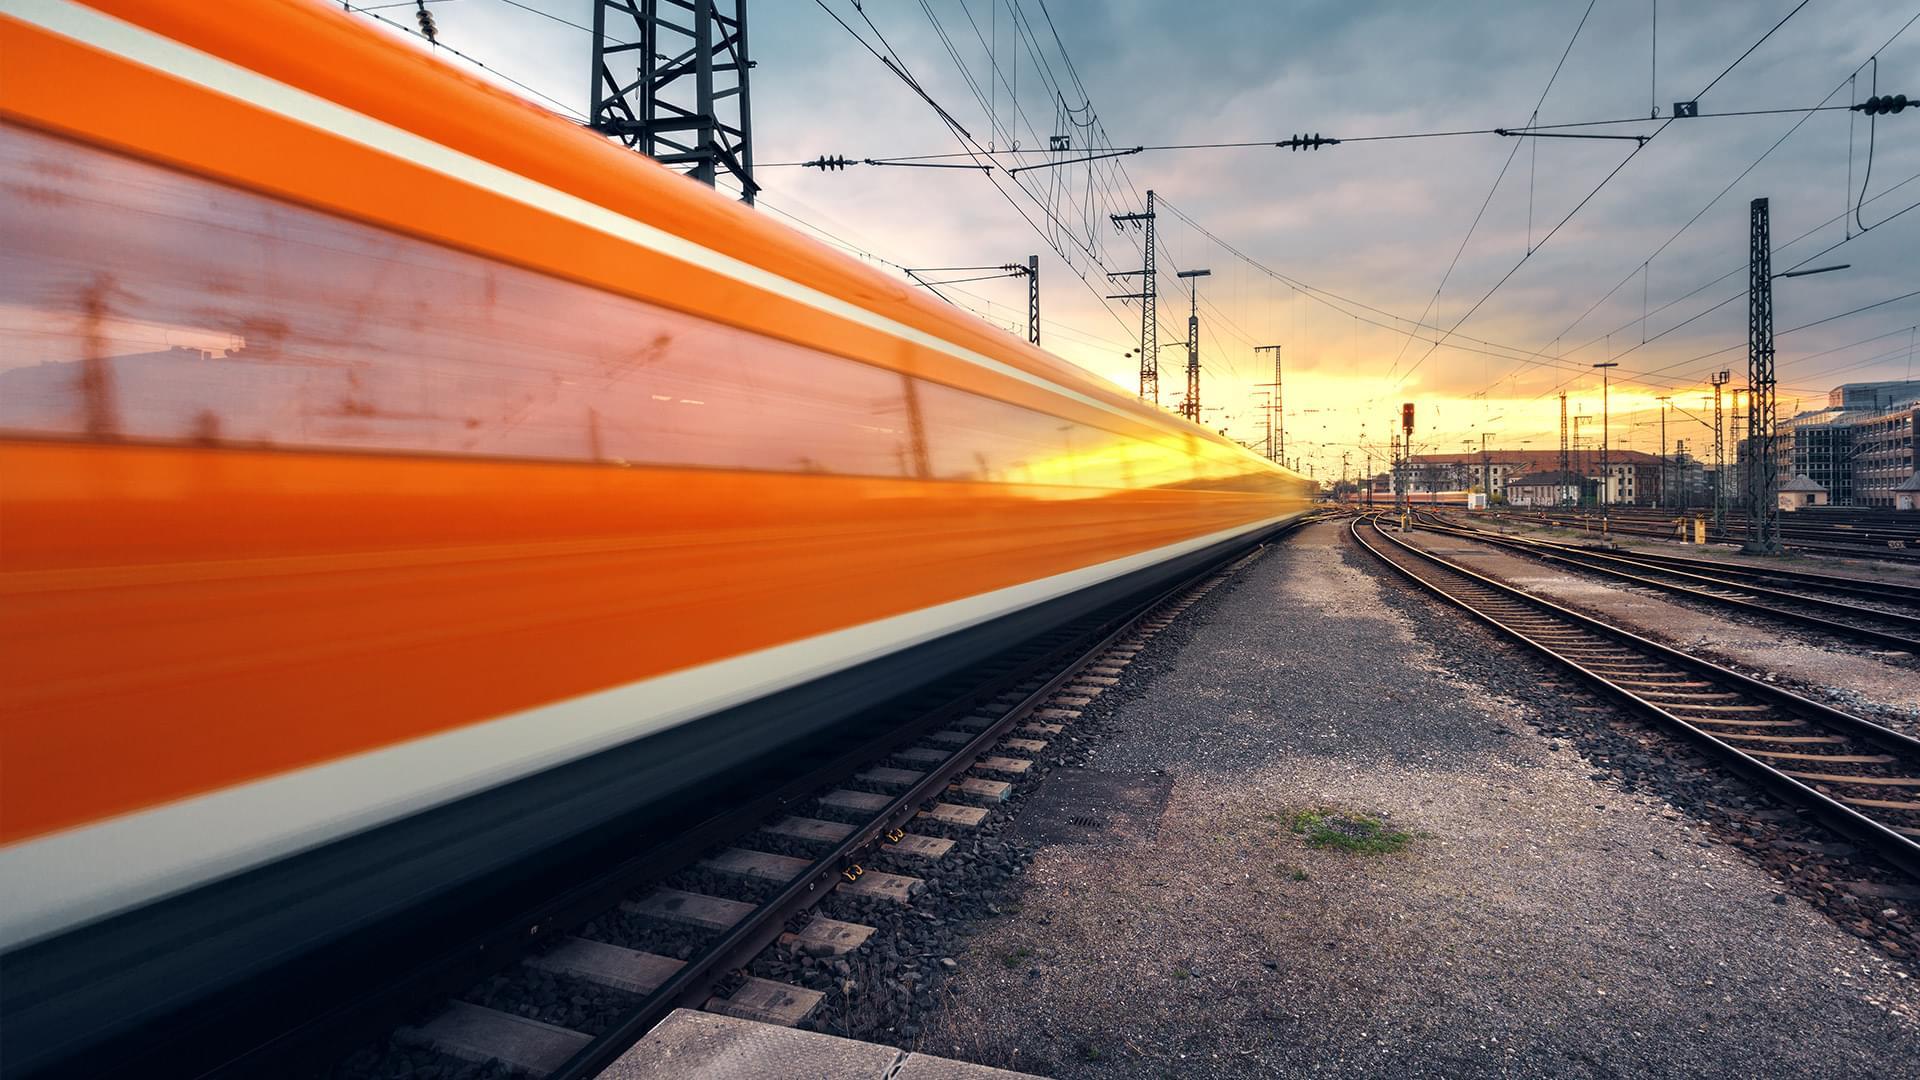 Amtrak Engineer's Post-Accident Drug Test Showed Marijuana, Opioids